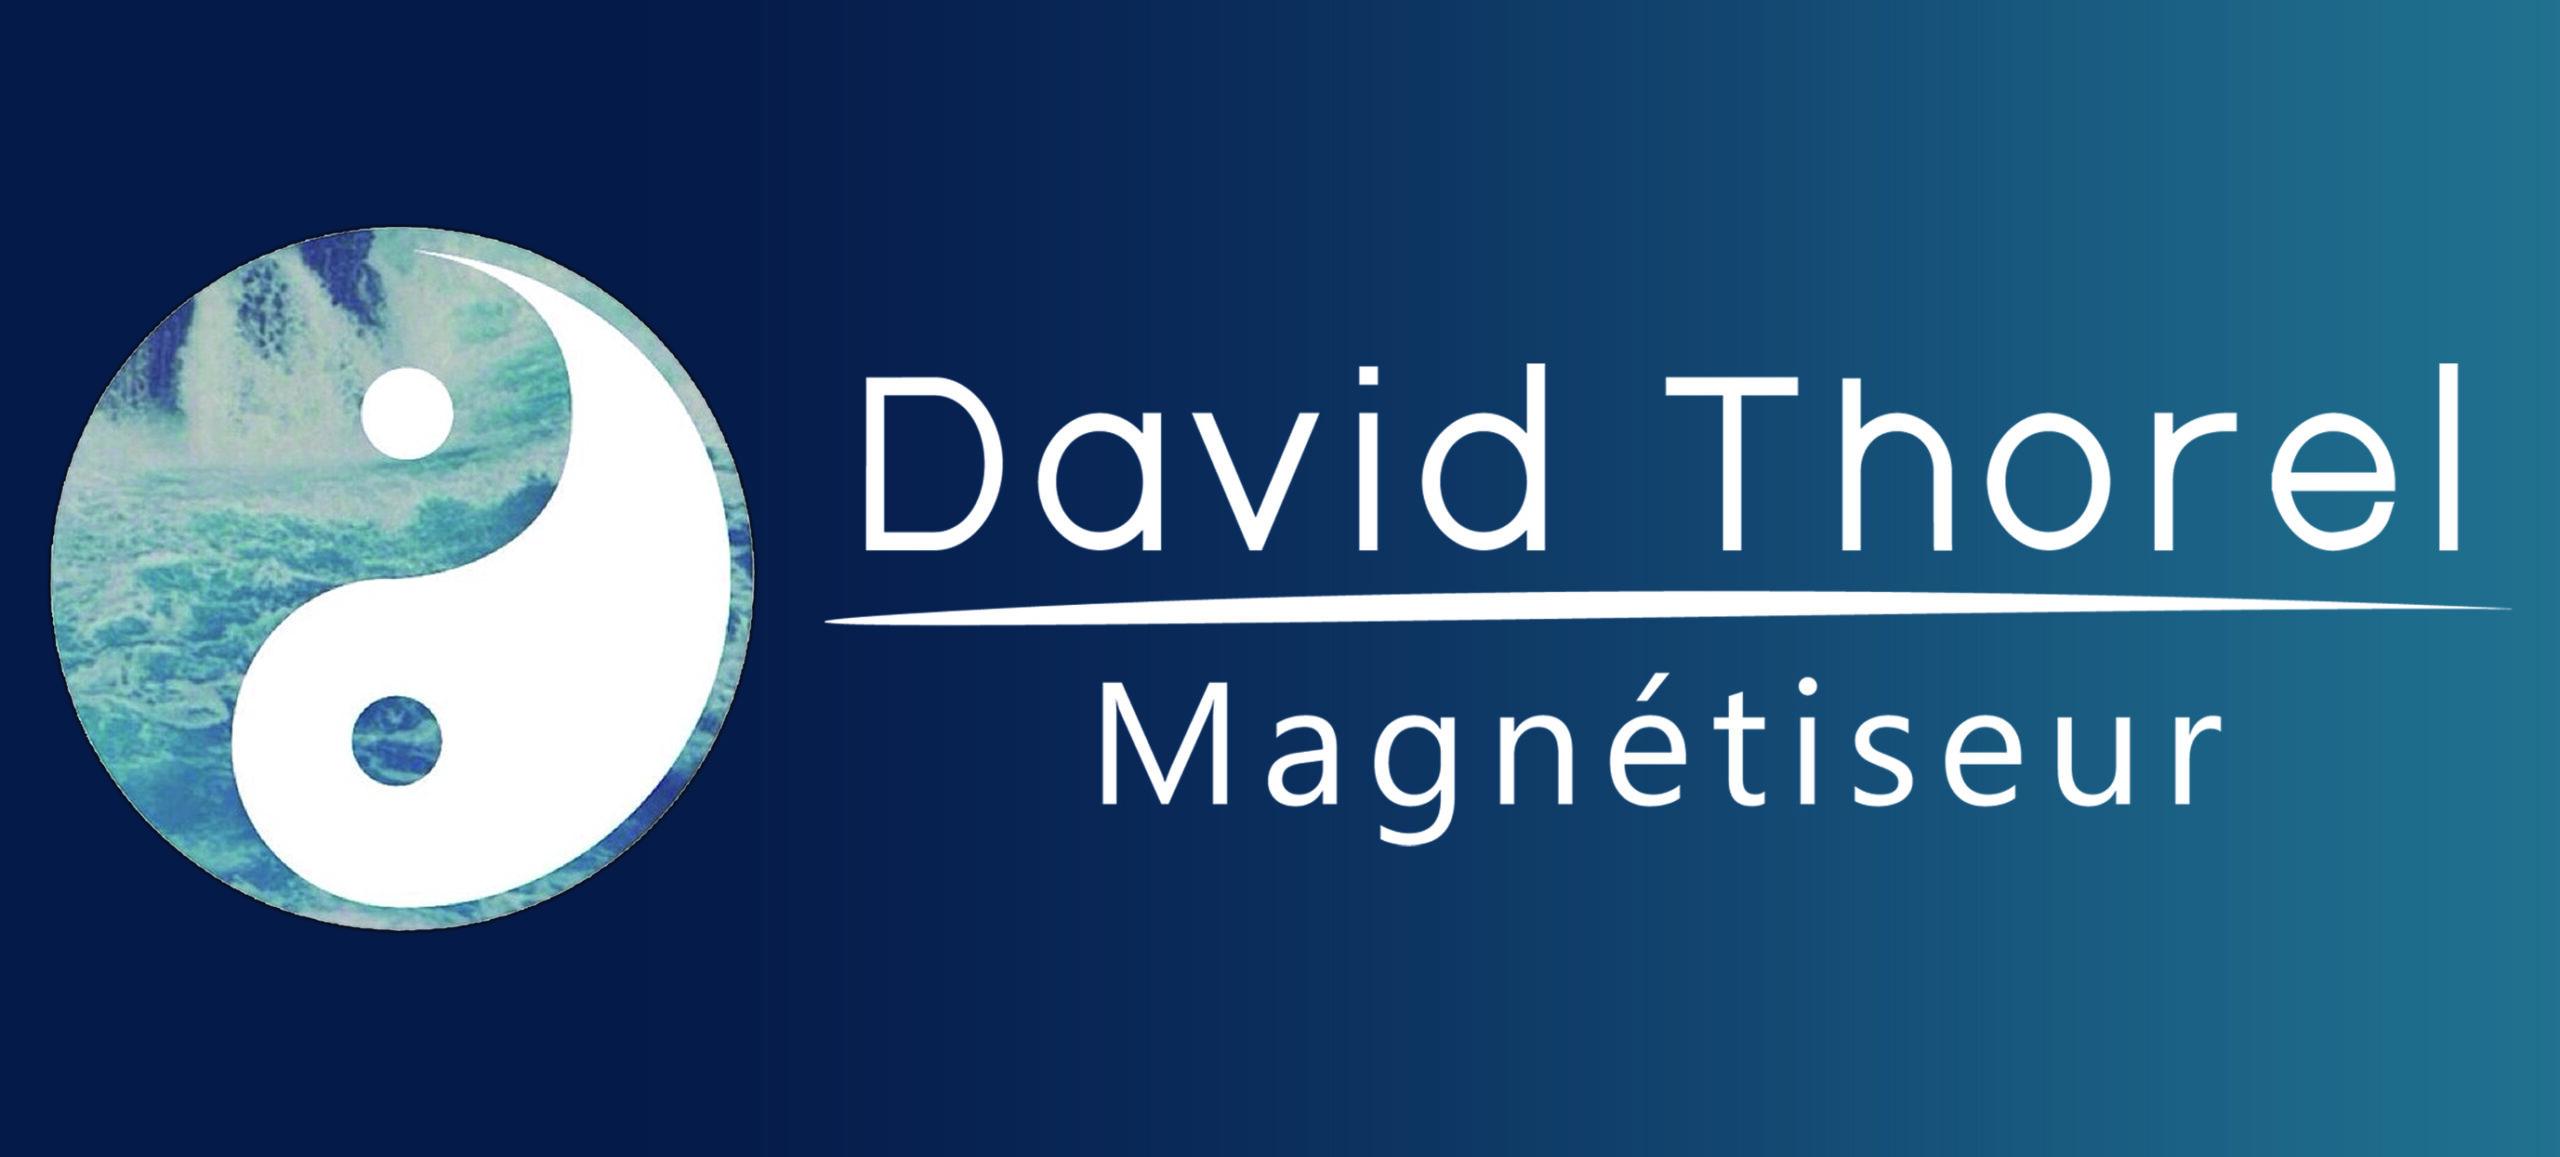 logo David Thorel Magnétiseur